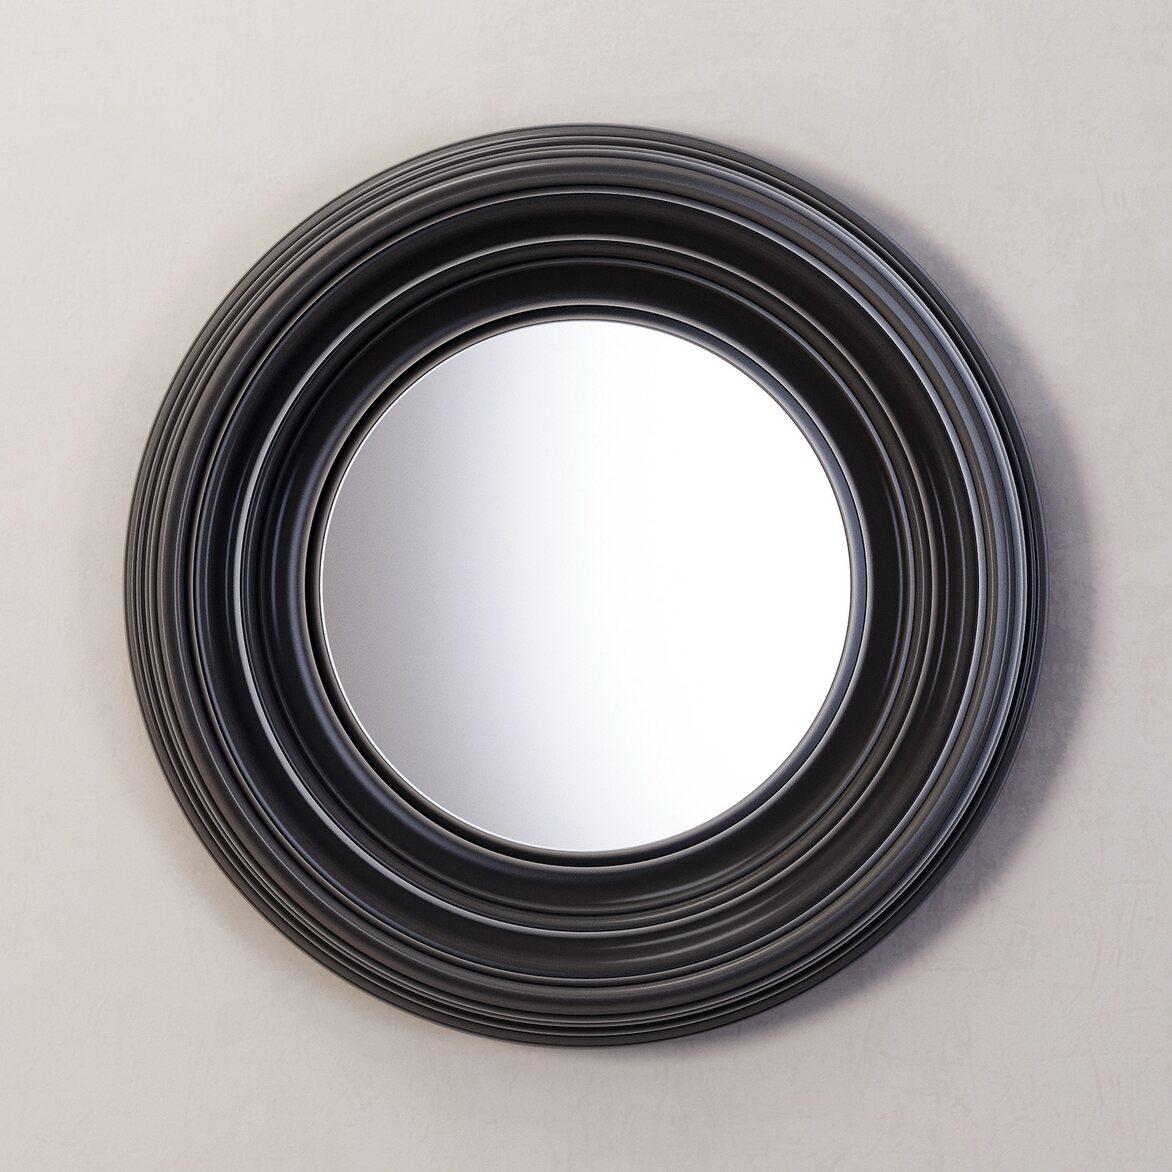 Зеркало Coventry, черное   Настенные зеркала Kingsby